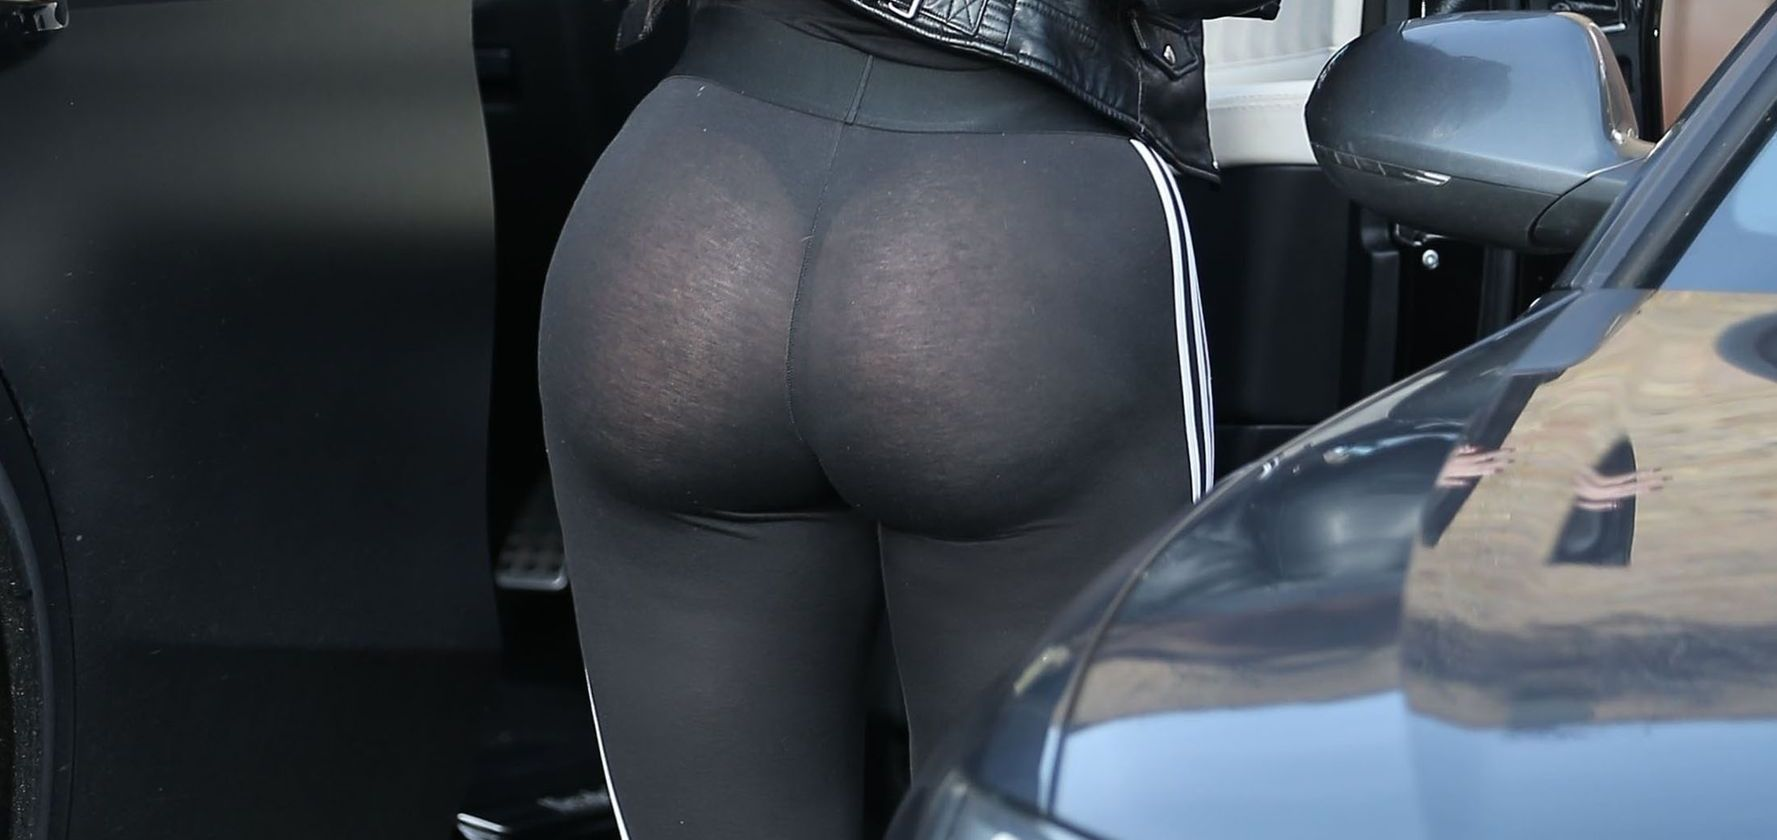 Lauren Goodger Looks Downcast As She Heads To A Meeting In Bexleyheath In Kent 000100000000000000000000000